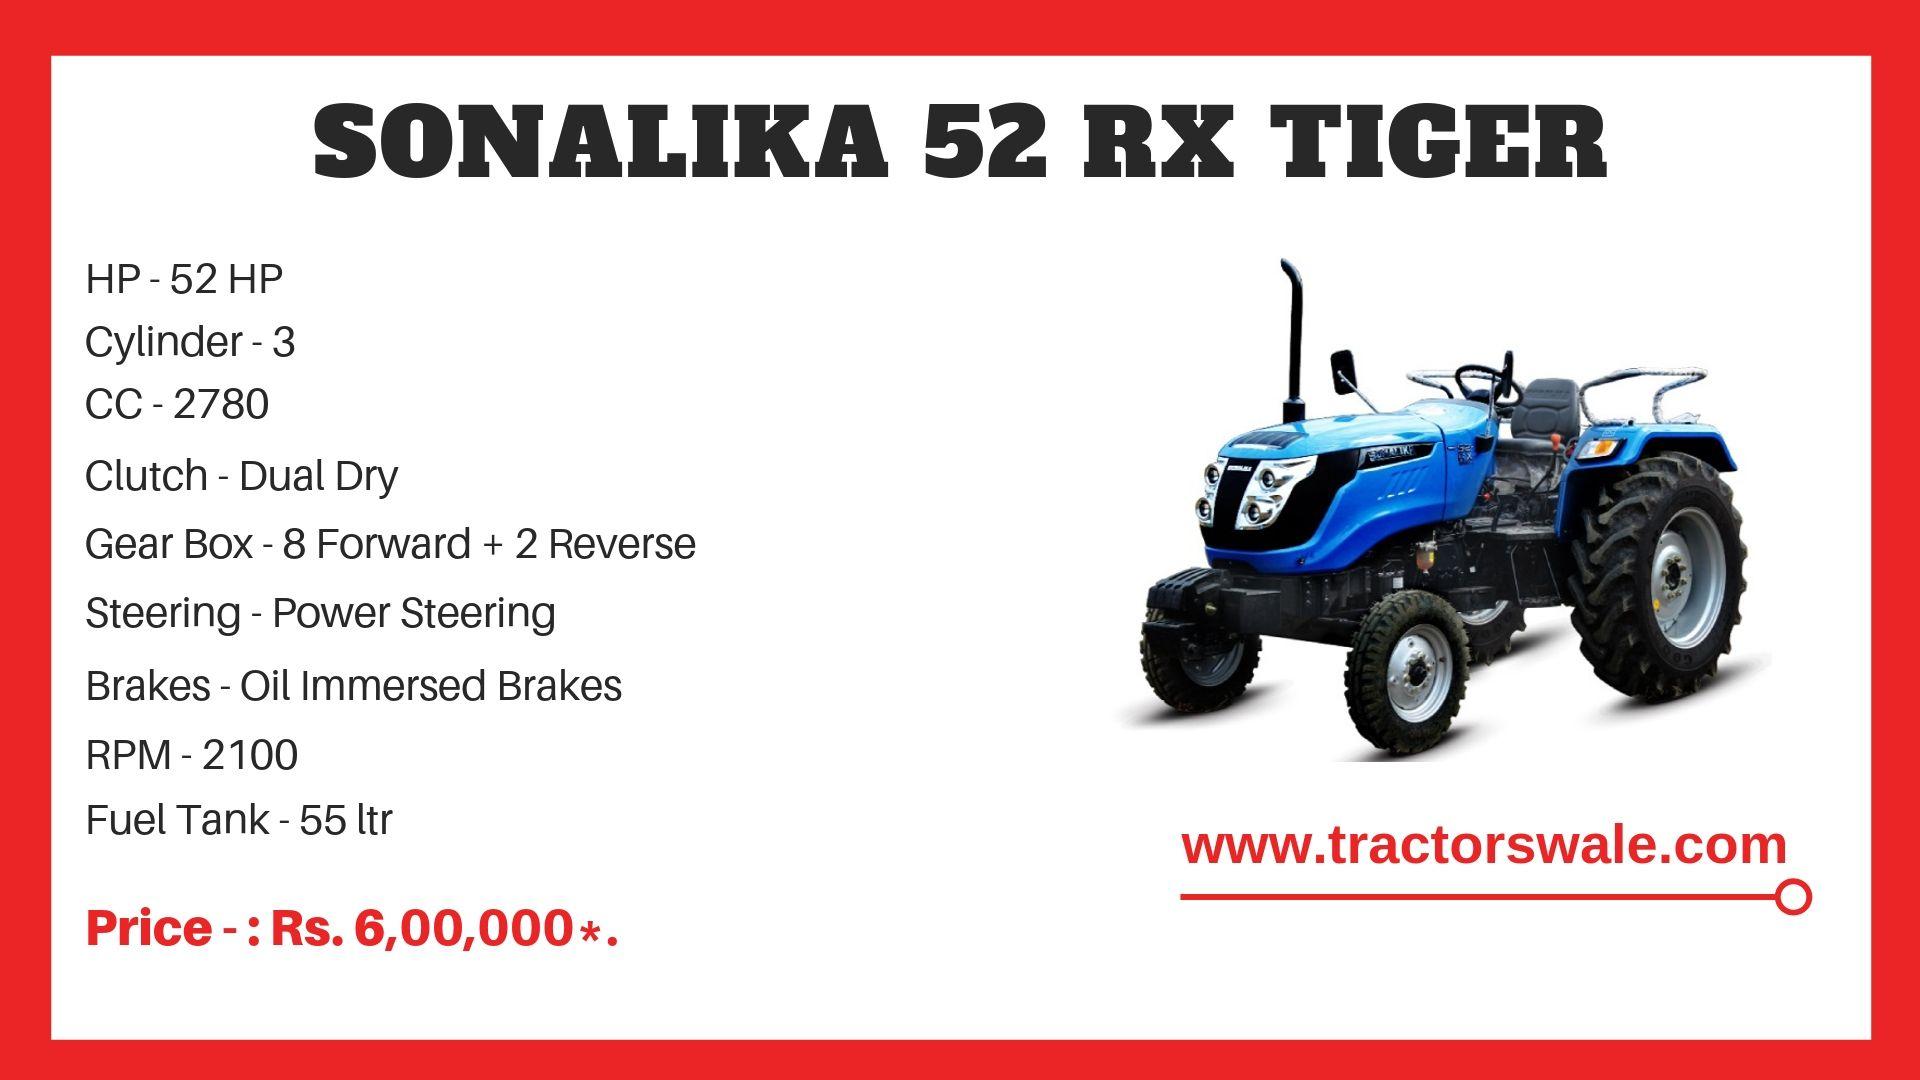 Sonalika 52 RX Tiger Tractor Price specs